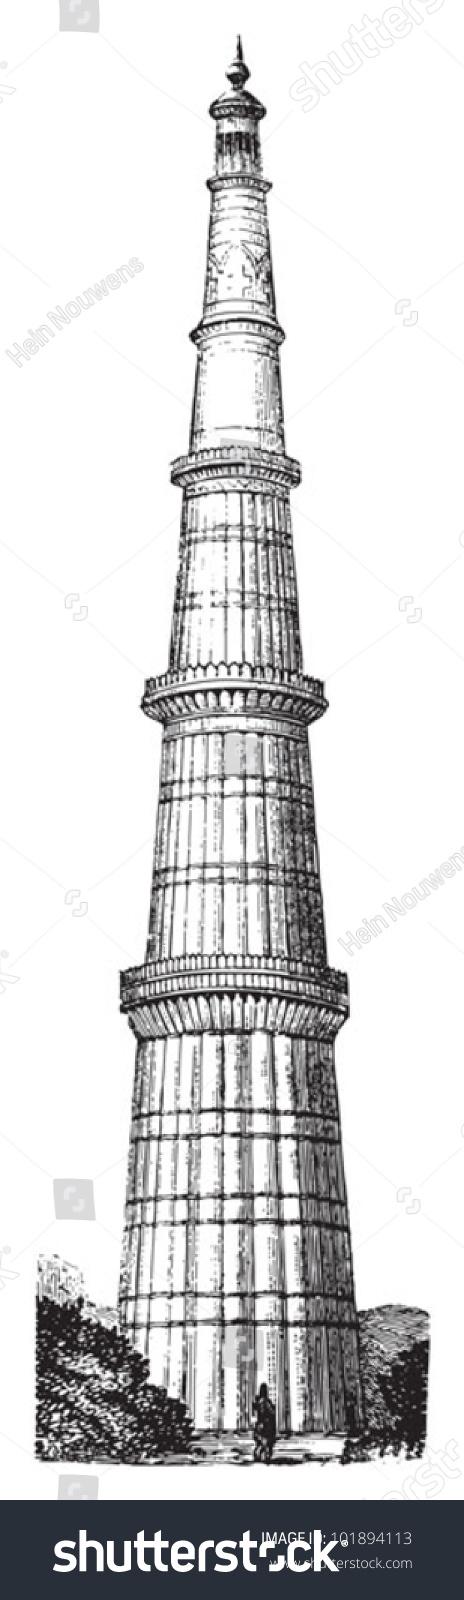 Line Drawing Of Qutub Minar : Colouring pages of qutub minar char free